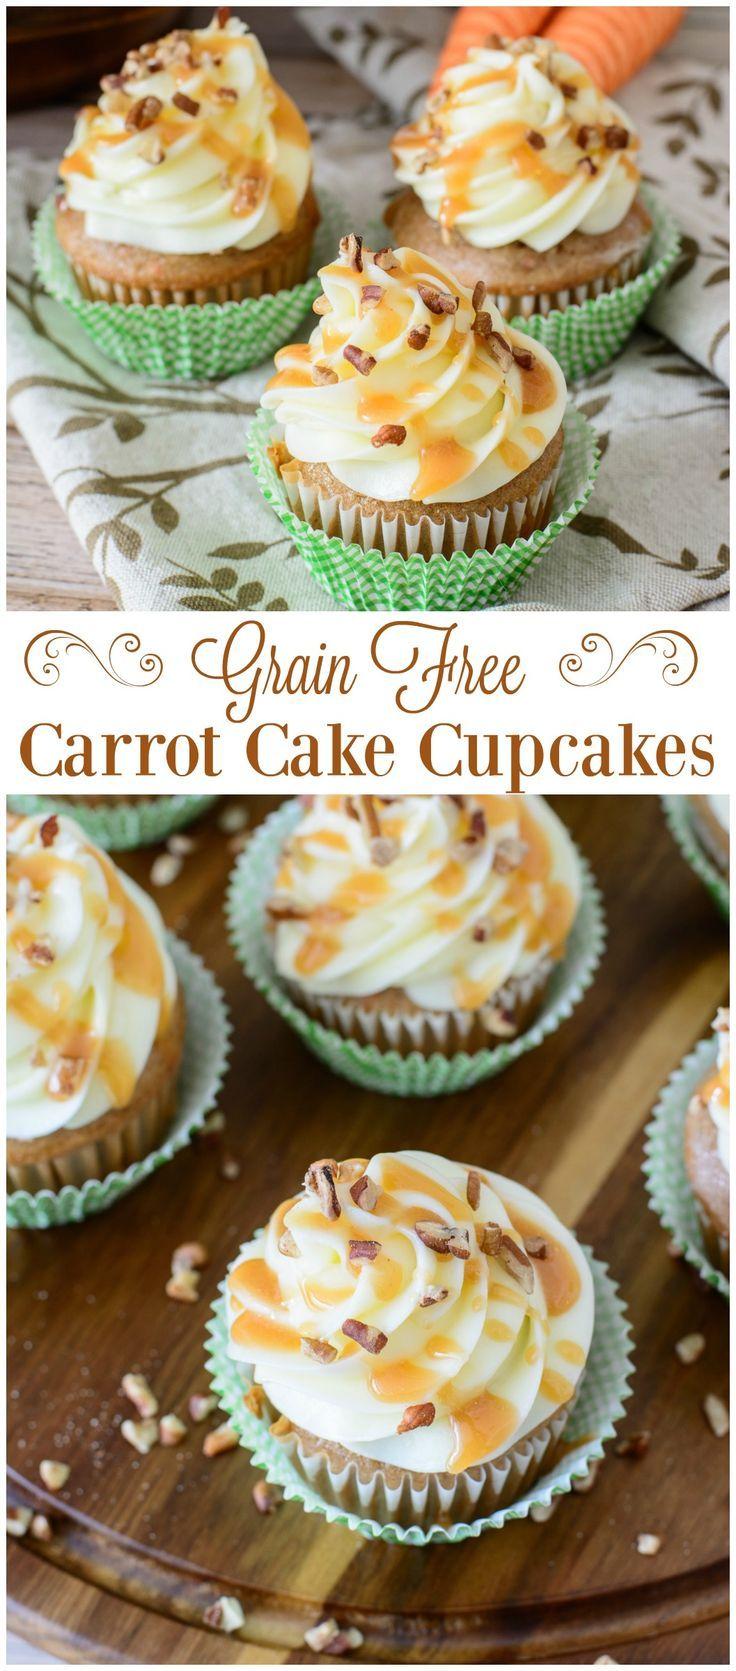 This irresistible grain free carrot cake cupcake recipe is